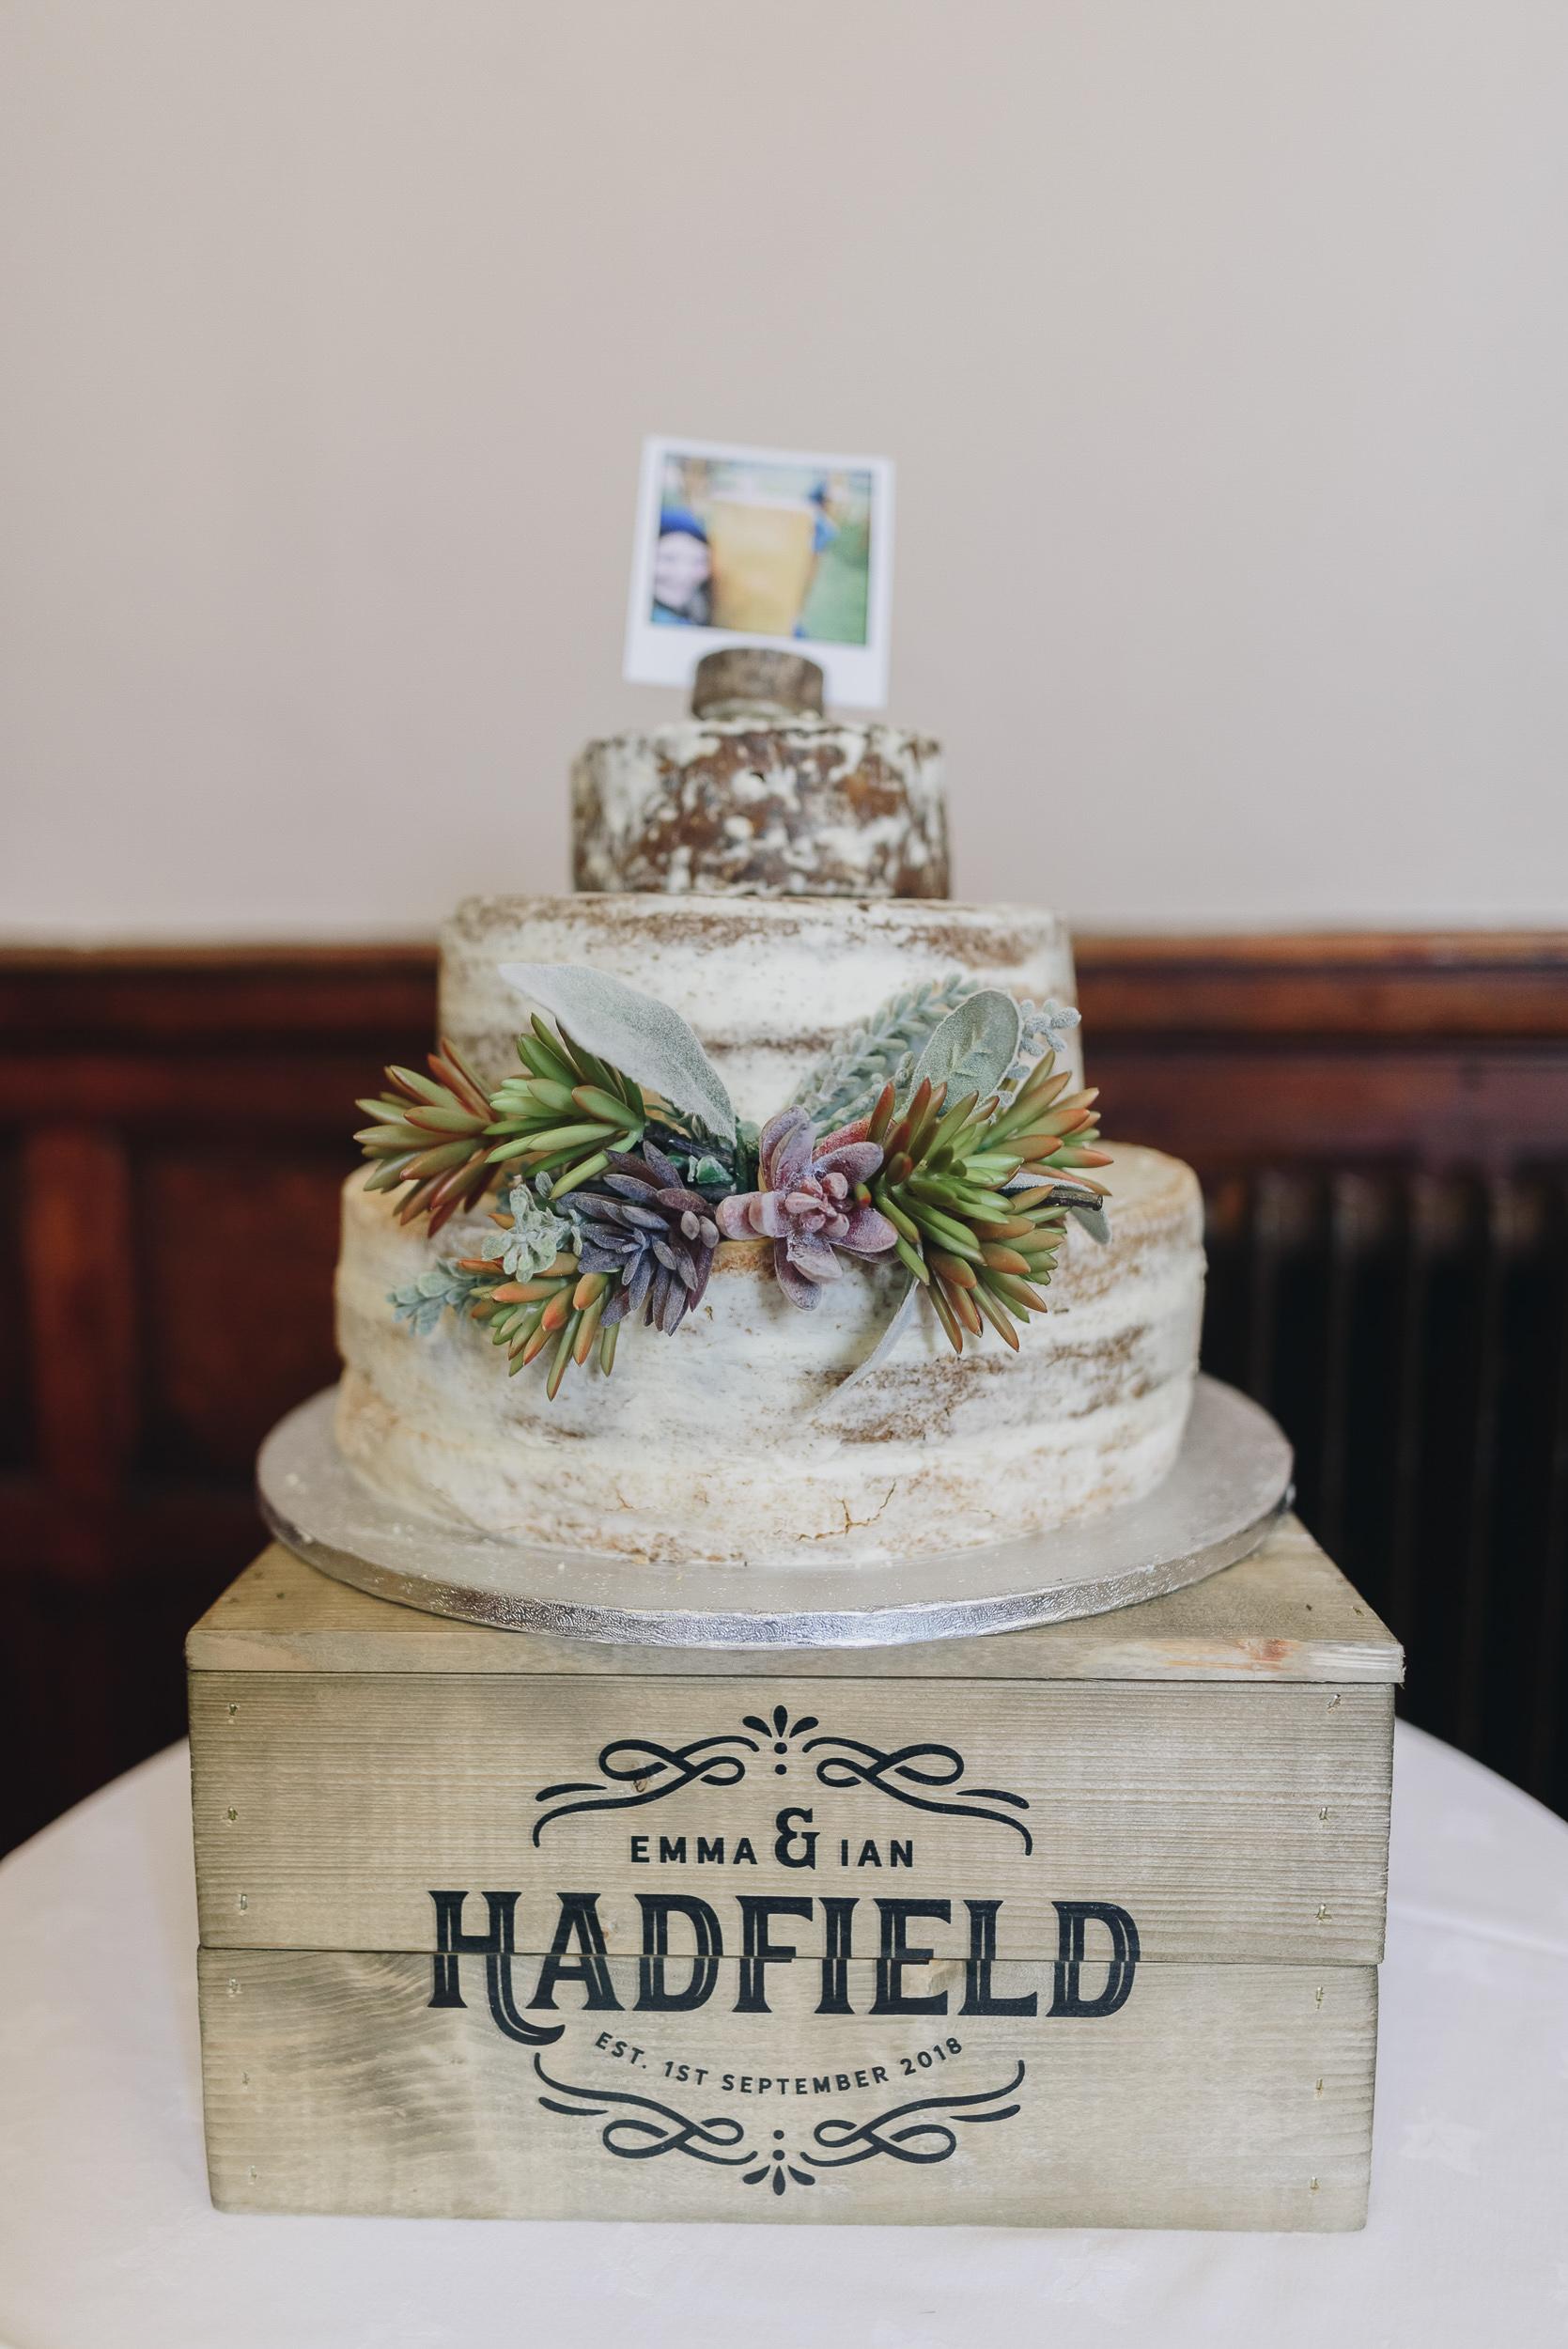 Smithills-hall-wedding-manchester-the-barlow-edgworth-hadfield-79.jpg